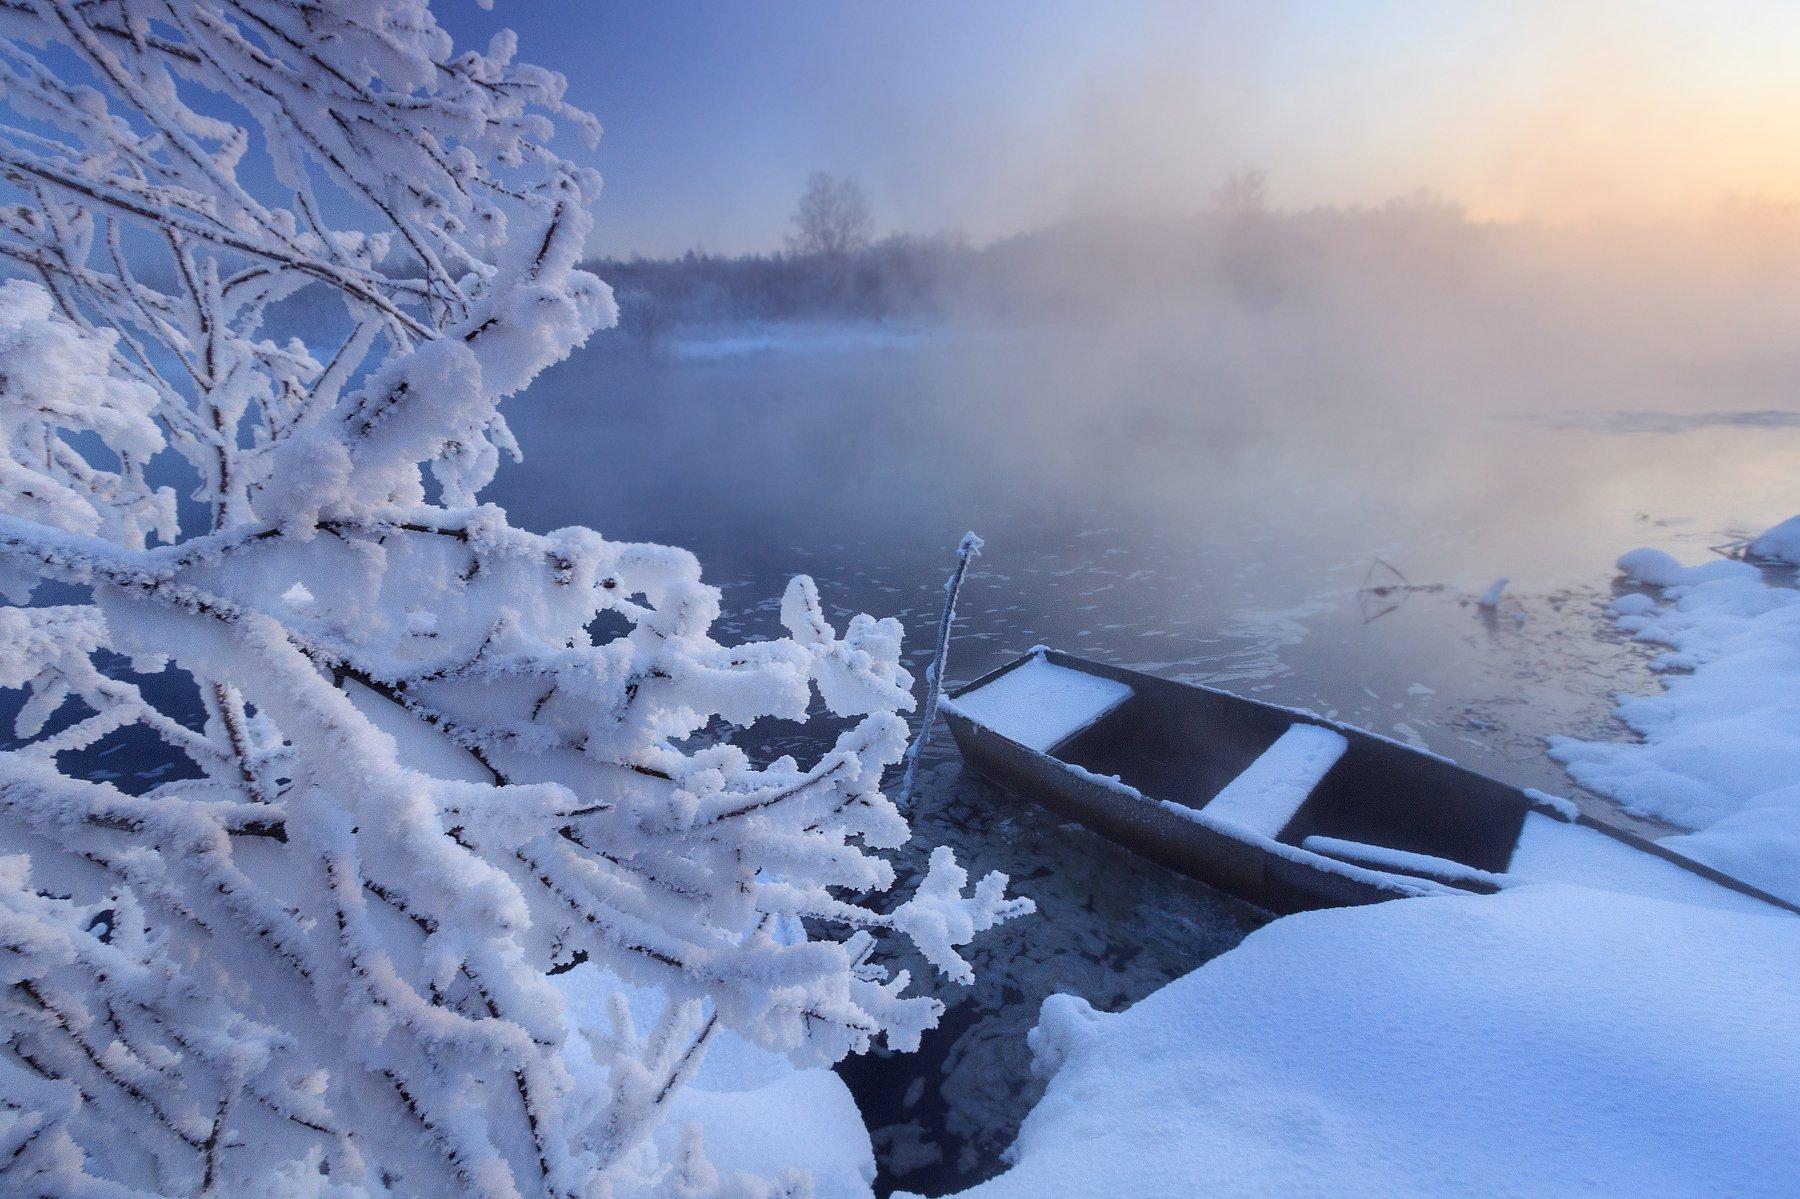 среднеуральск, урал, средний урал, зима, река, мороз, грэс, Сергей Гарифуллин